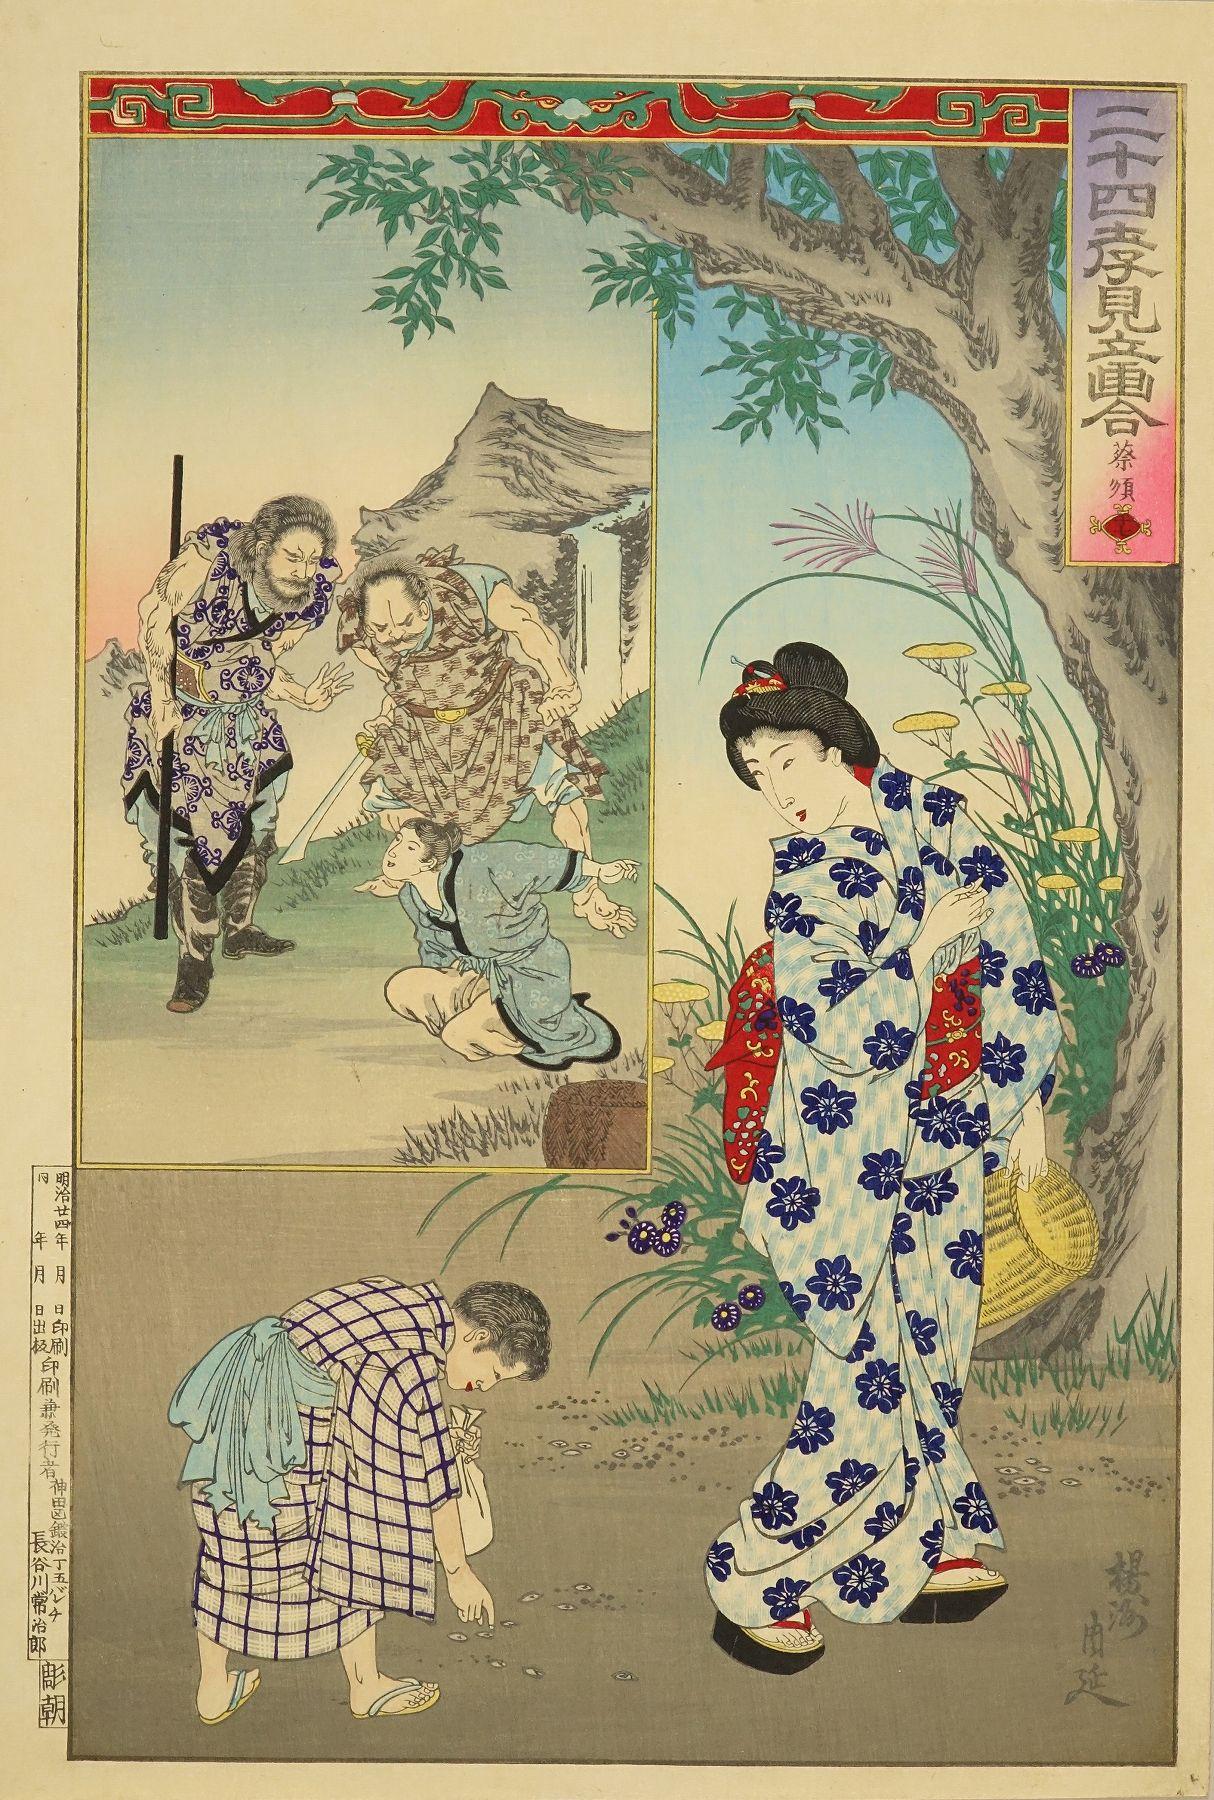 CHIKANOBU Cai Shun, from <i>Nijushiko mitate e awase</i> (Parody of twenty-four filial pieties)